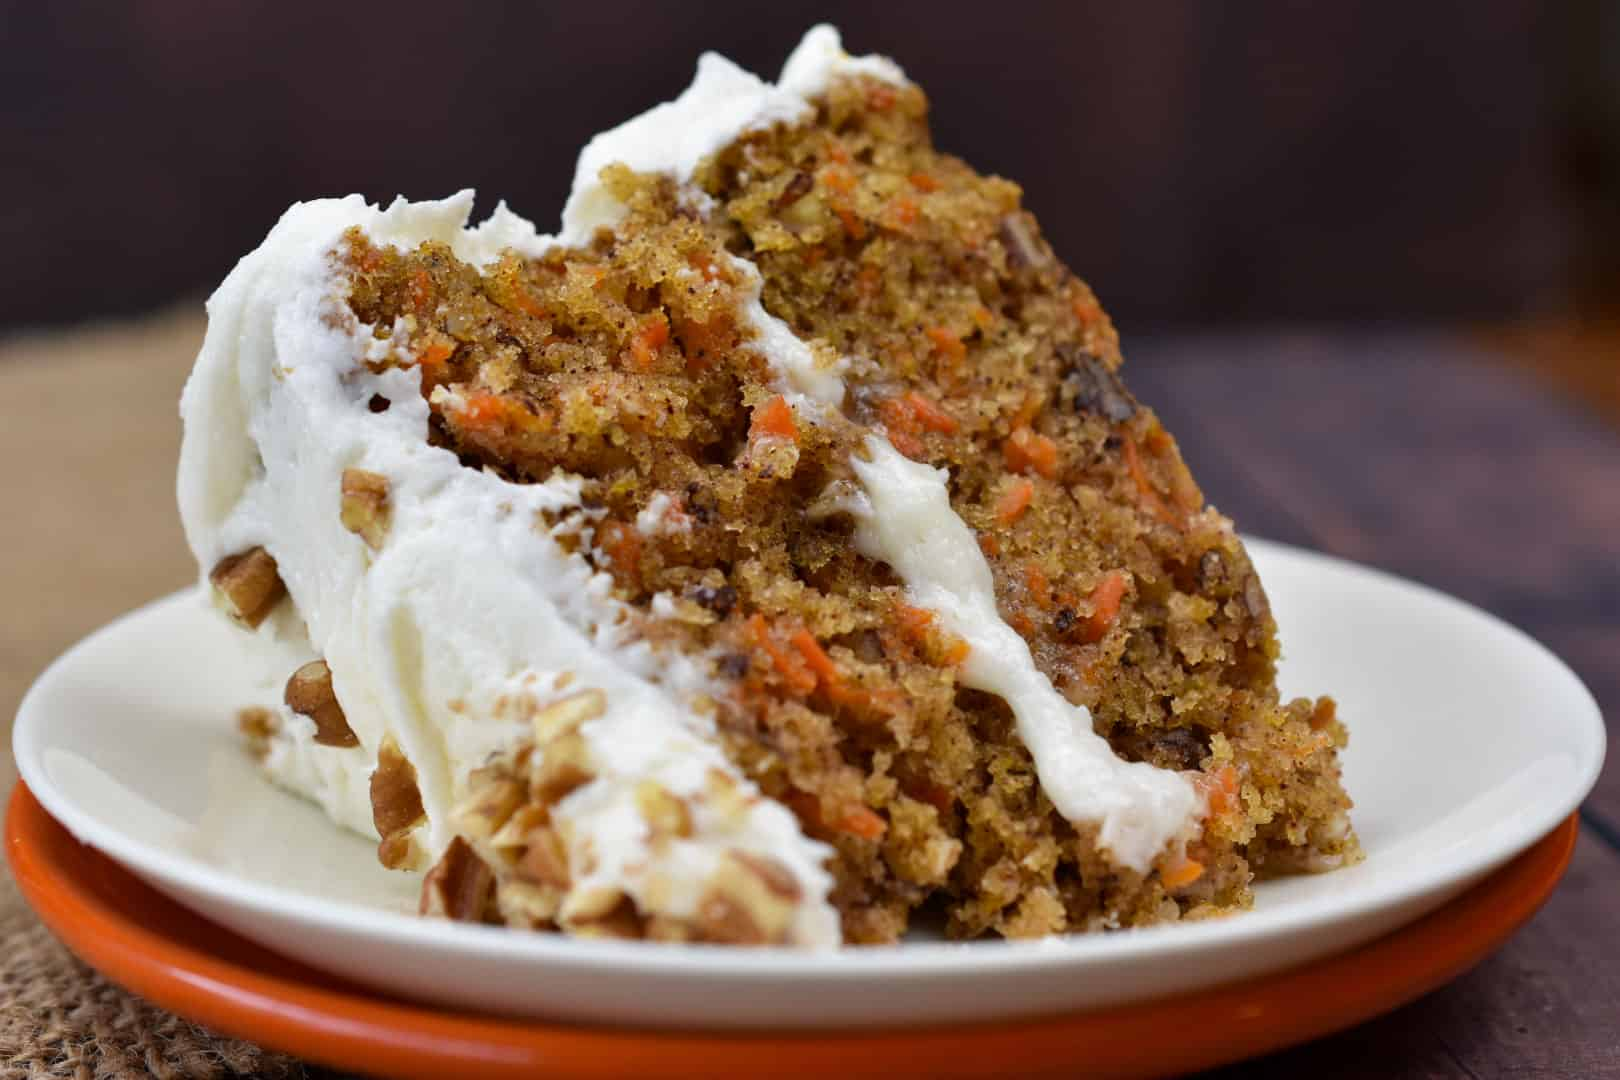 closeup of pecan carrot cake on a plate